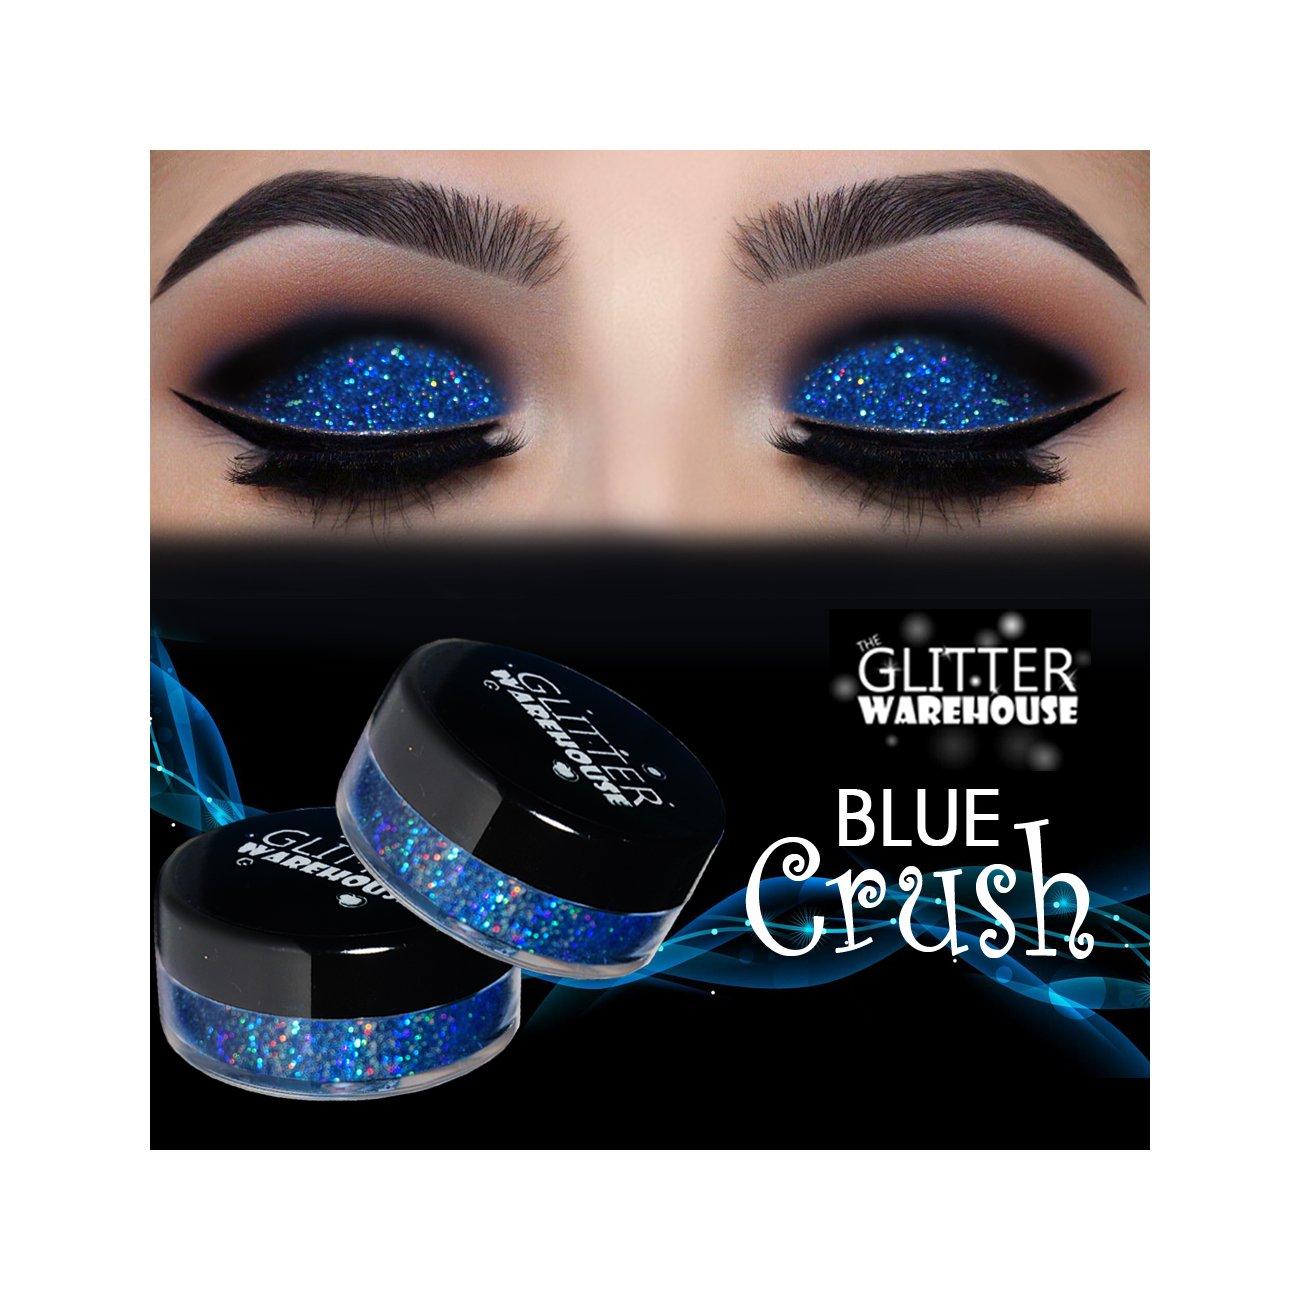 GlitterWarehouse Blue Crush Holographic Loose Glitter Powder for Eyeshadow, Makeup, Nail Art, Body Tattoo